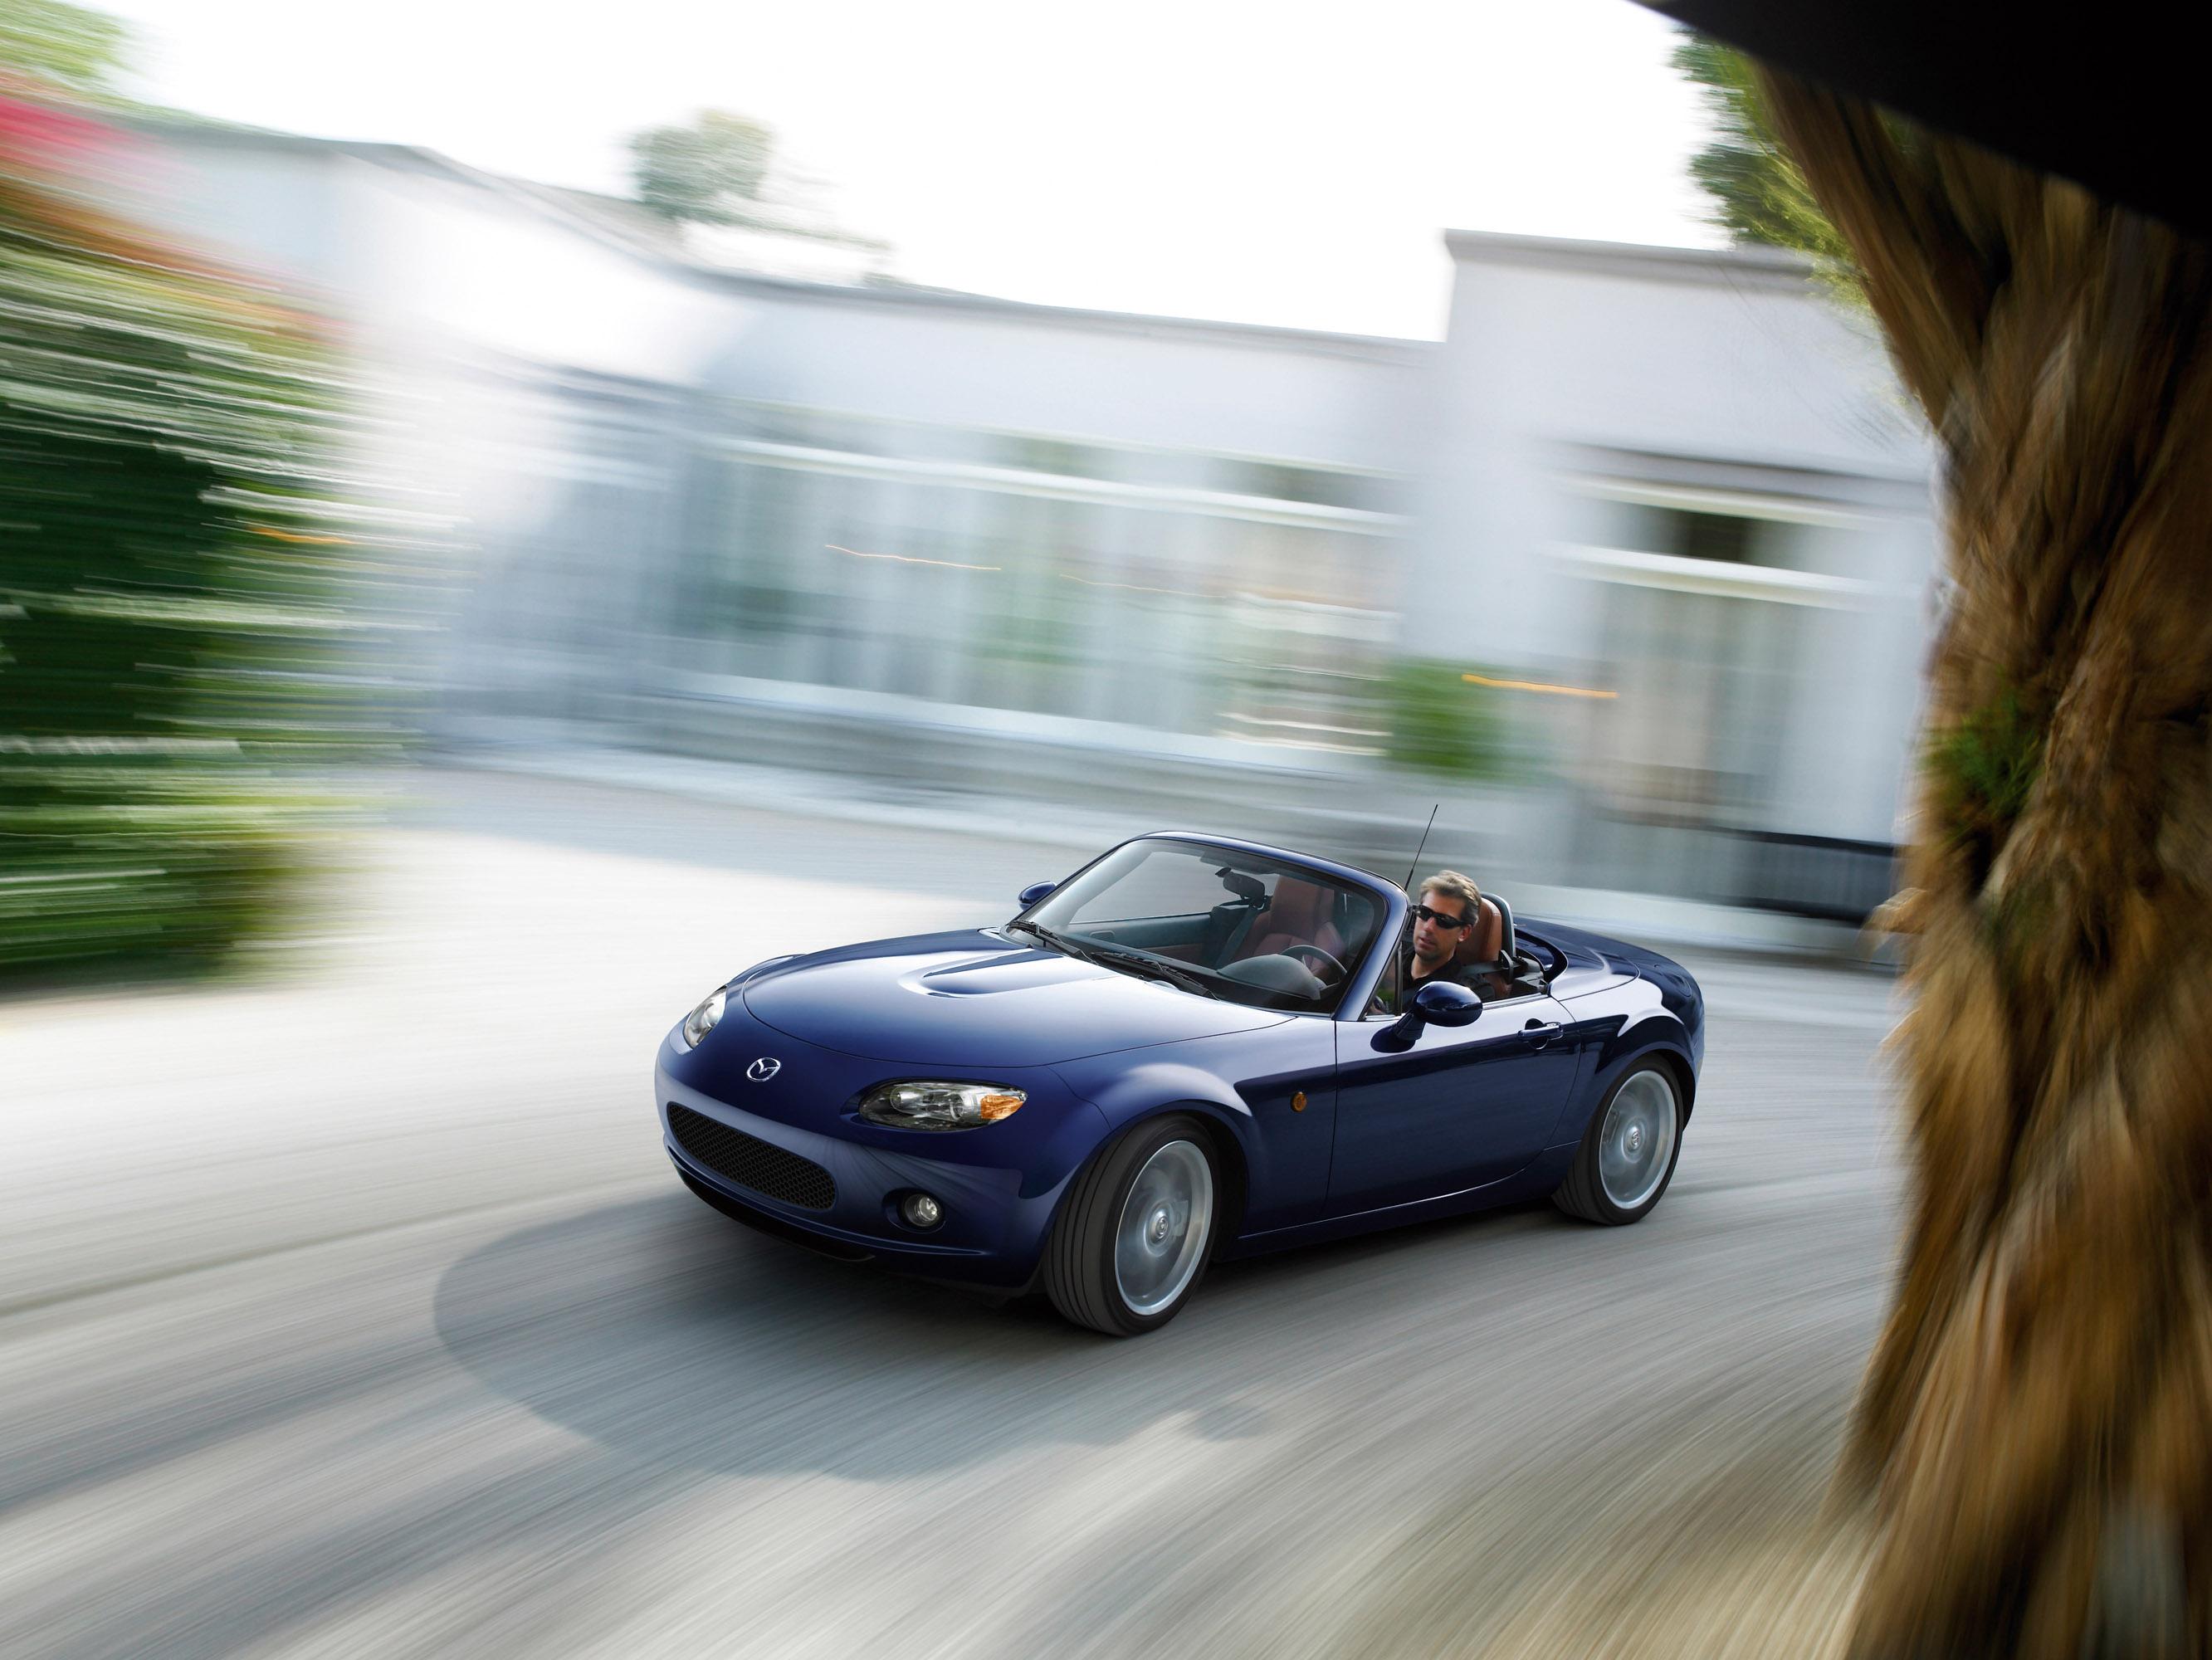 https://www.carsinvasion.com/gallery/2006-mazda-mx-5-roadster-coupe/2006-mazda-mx-5-roadster-coupe-11.jpg